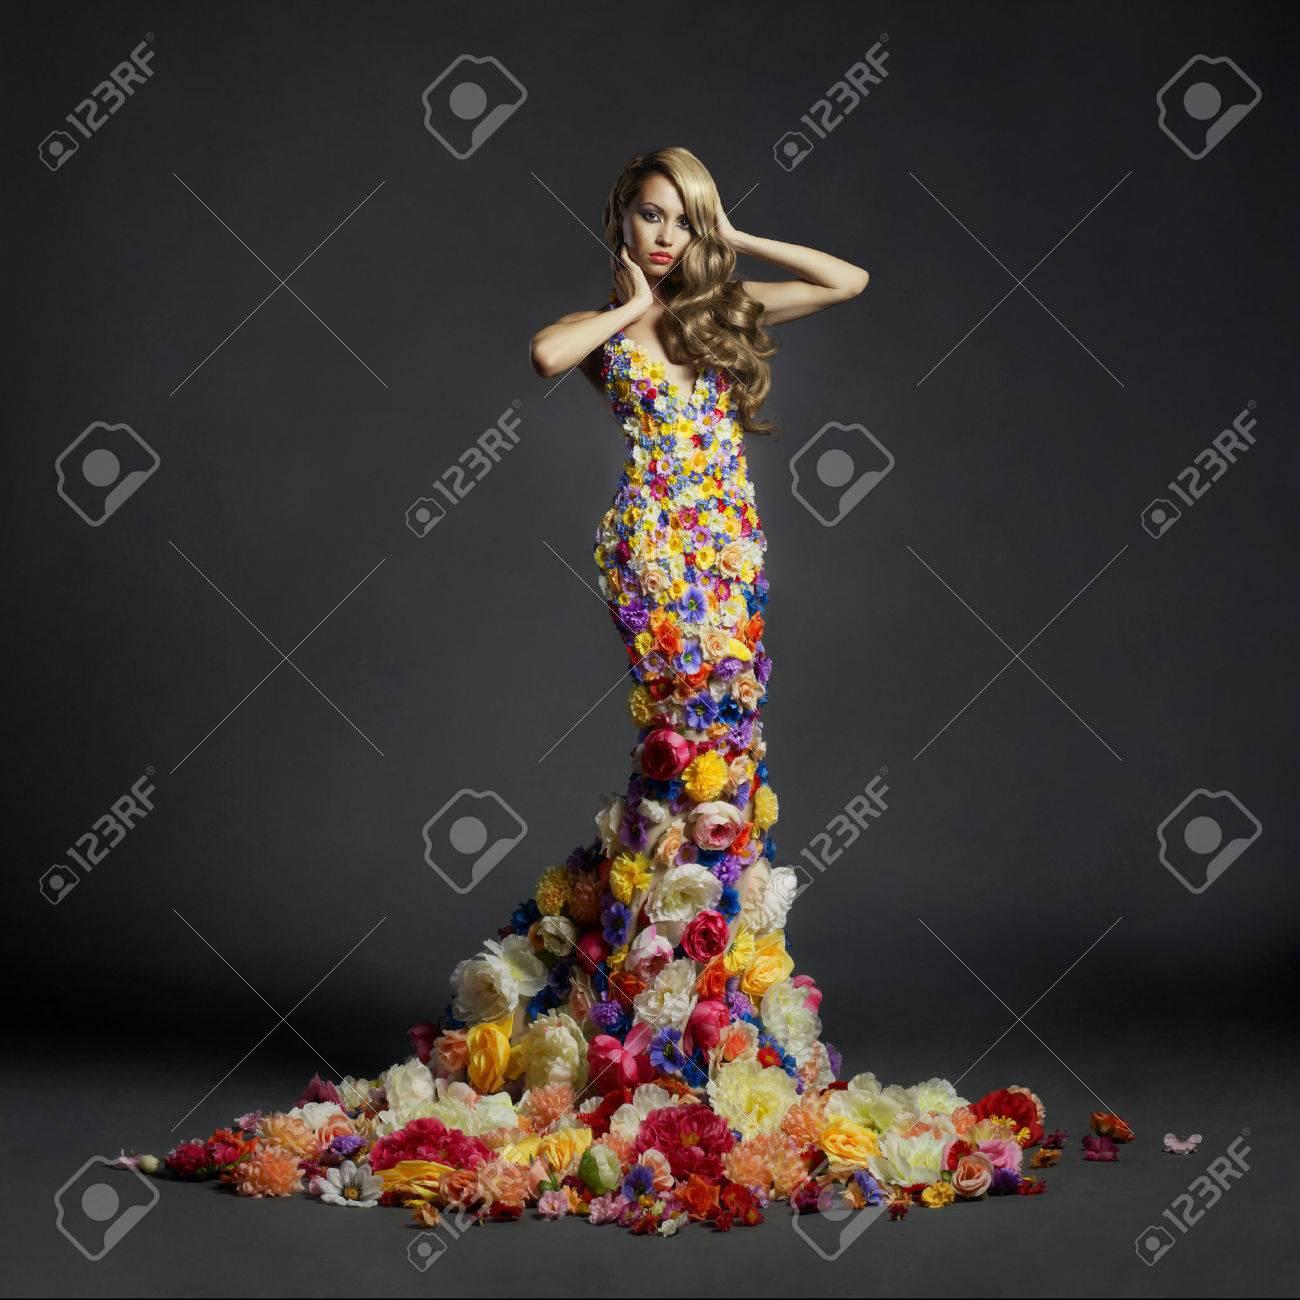 Studio portrait of blooming gorgeous lady in dress of flowers Standard-Bild - 32937293